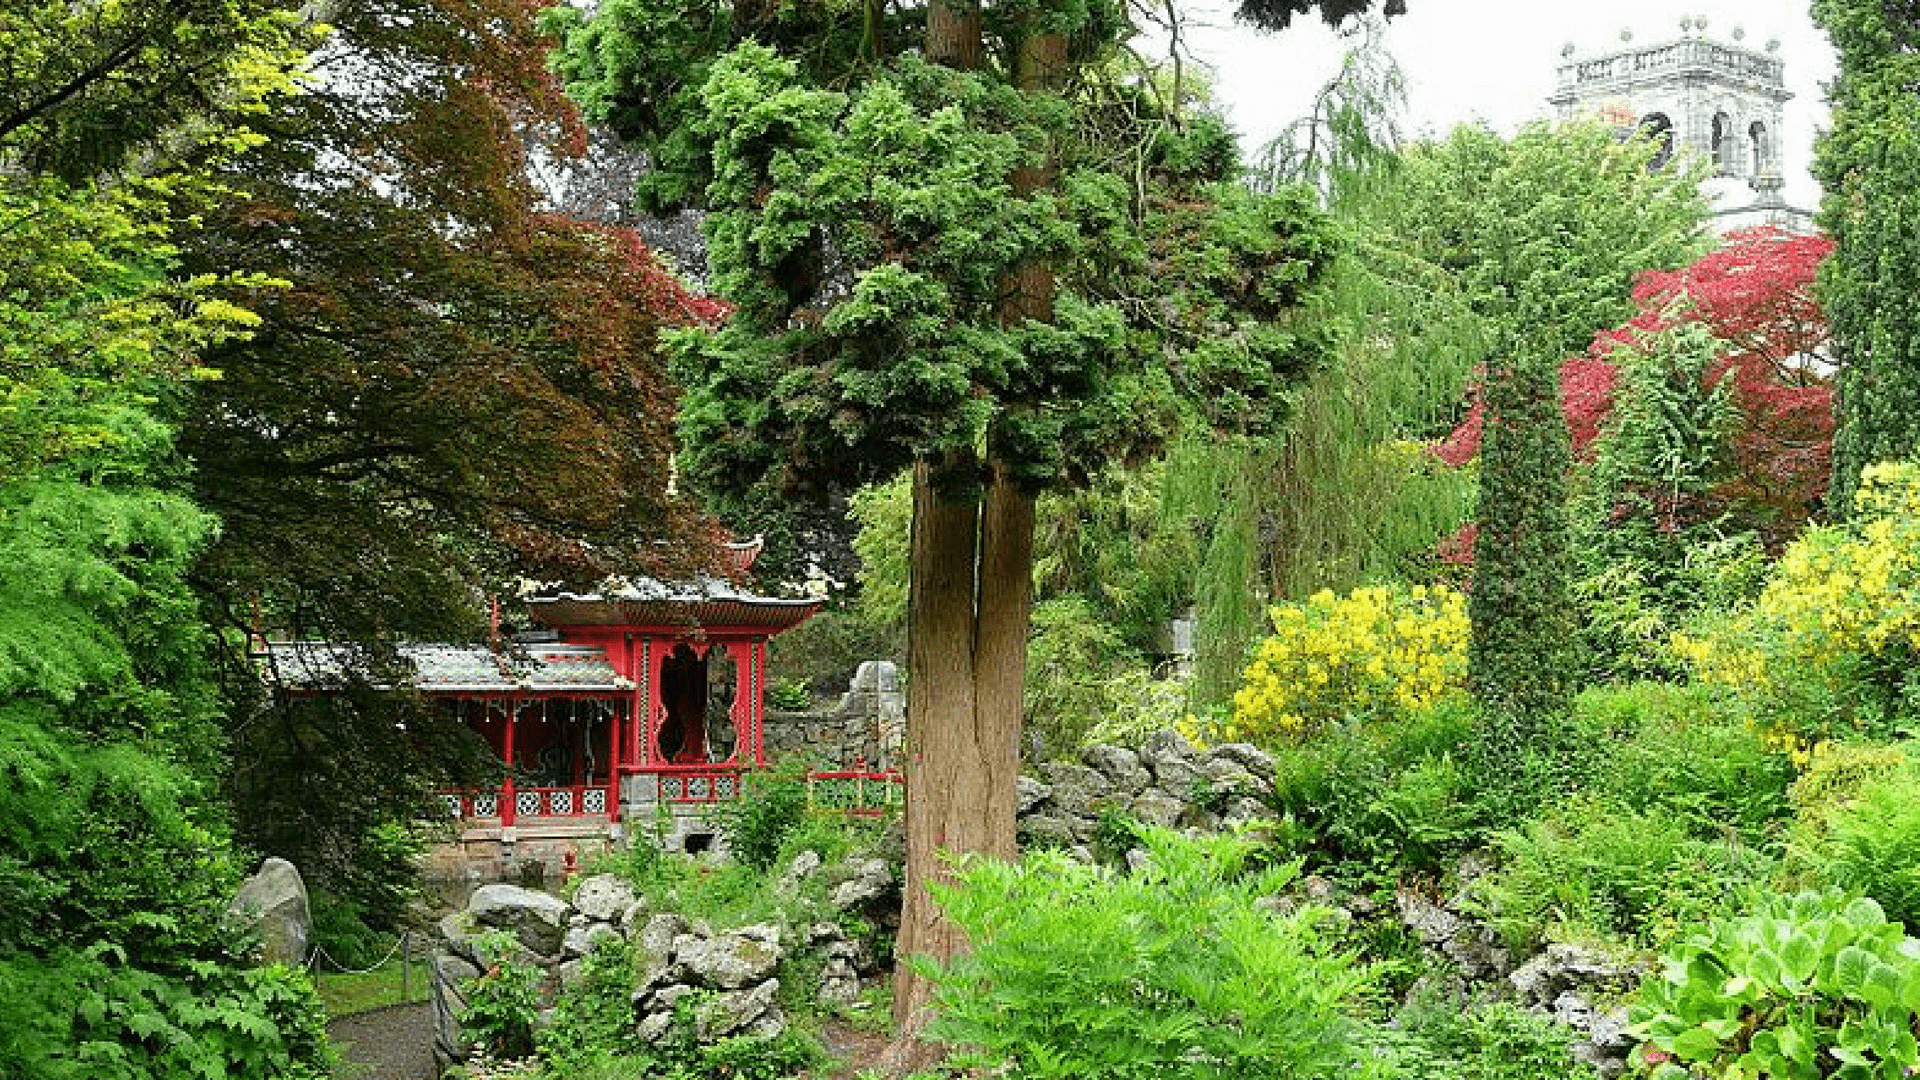 Chinese Temple - Biddulph Grange Garden